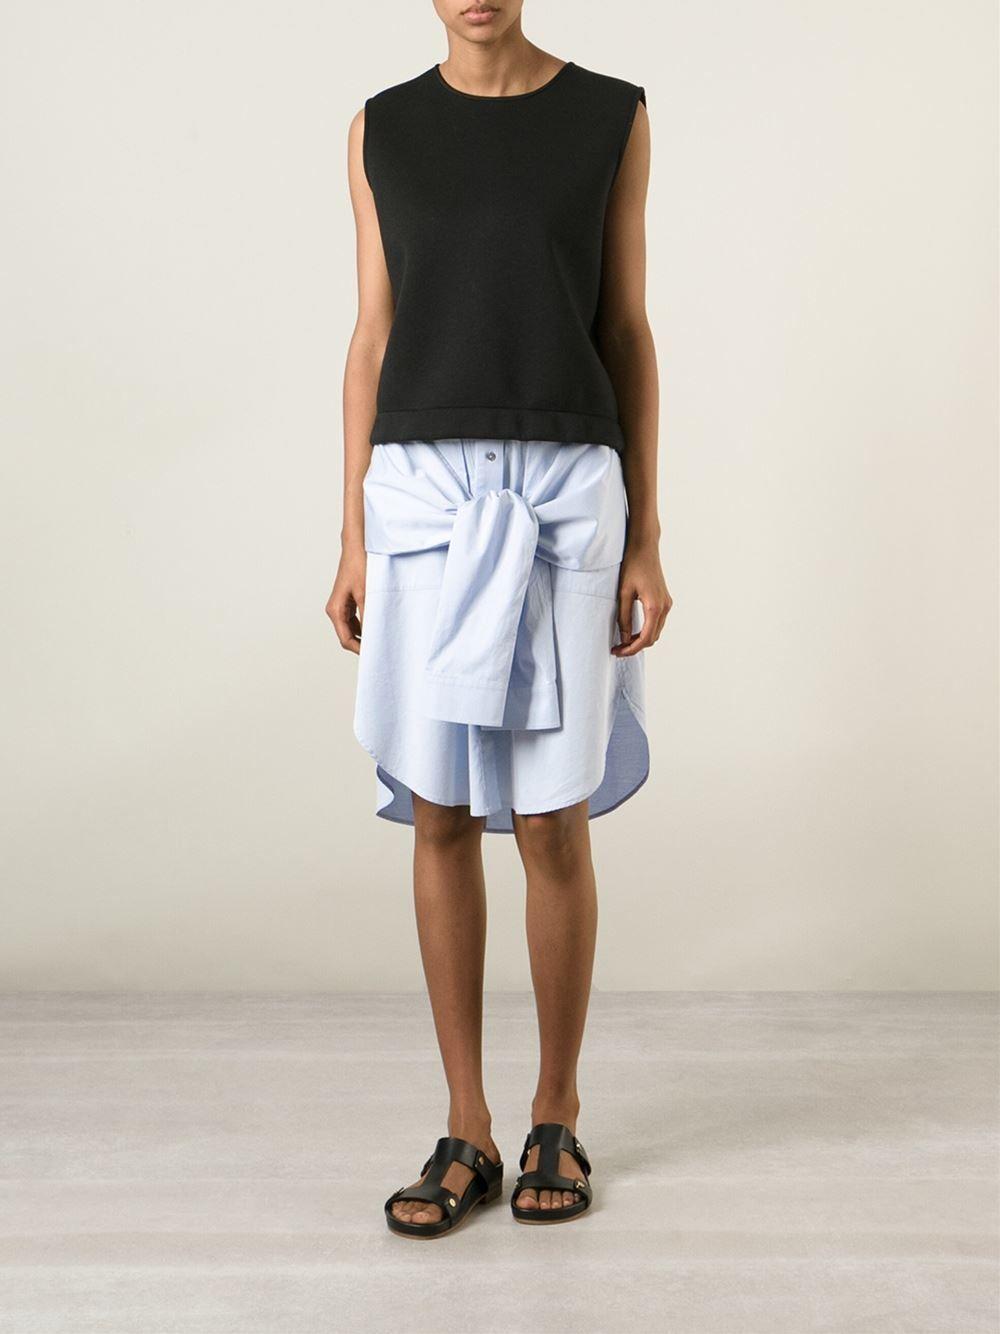 T By Alexander Wang Sleeve Ties Skirt - Ottodisanpietro - Farfetch.com 296,00 €